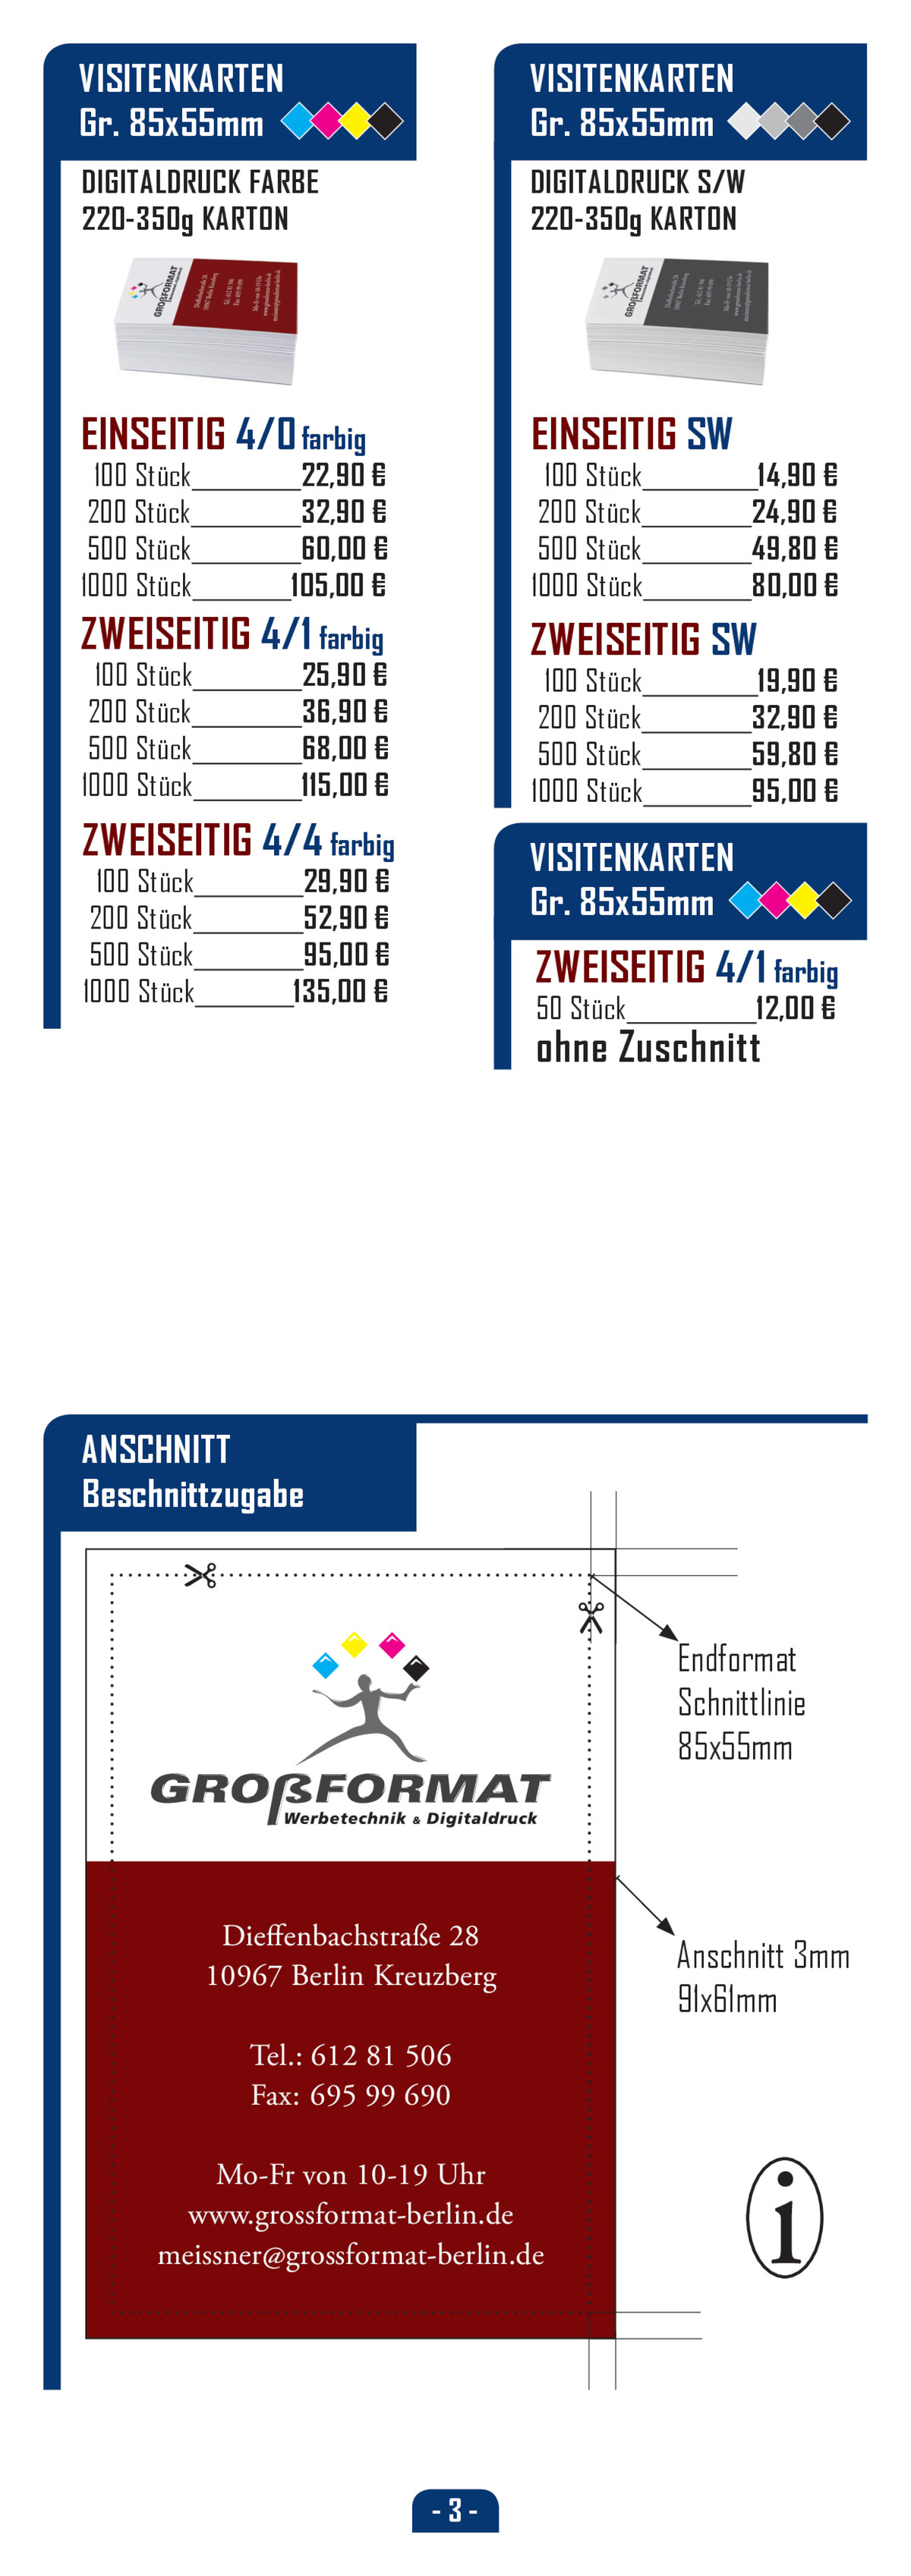 GROßFORMAT Berlin - Druck- und Kopier-Service in Berlin